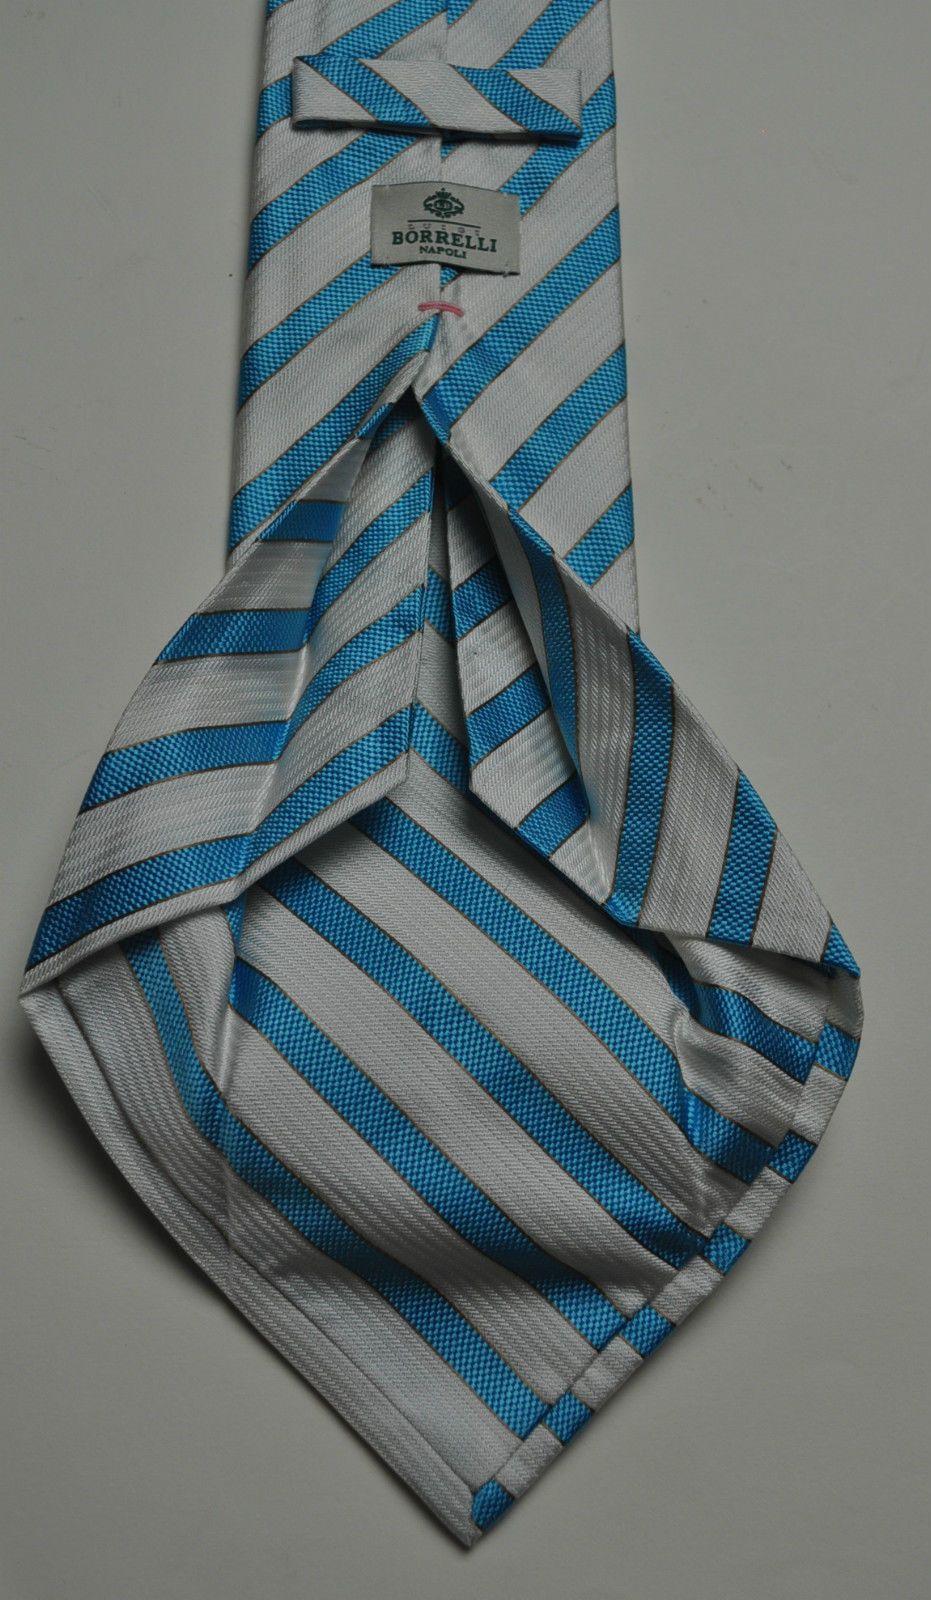 1f86451f865e13 NWT BORRELLI Napoli 7 Fold Silk Tie Handmade in Italy